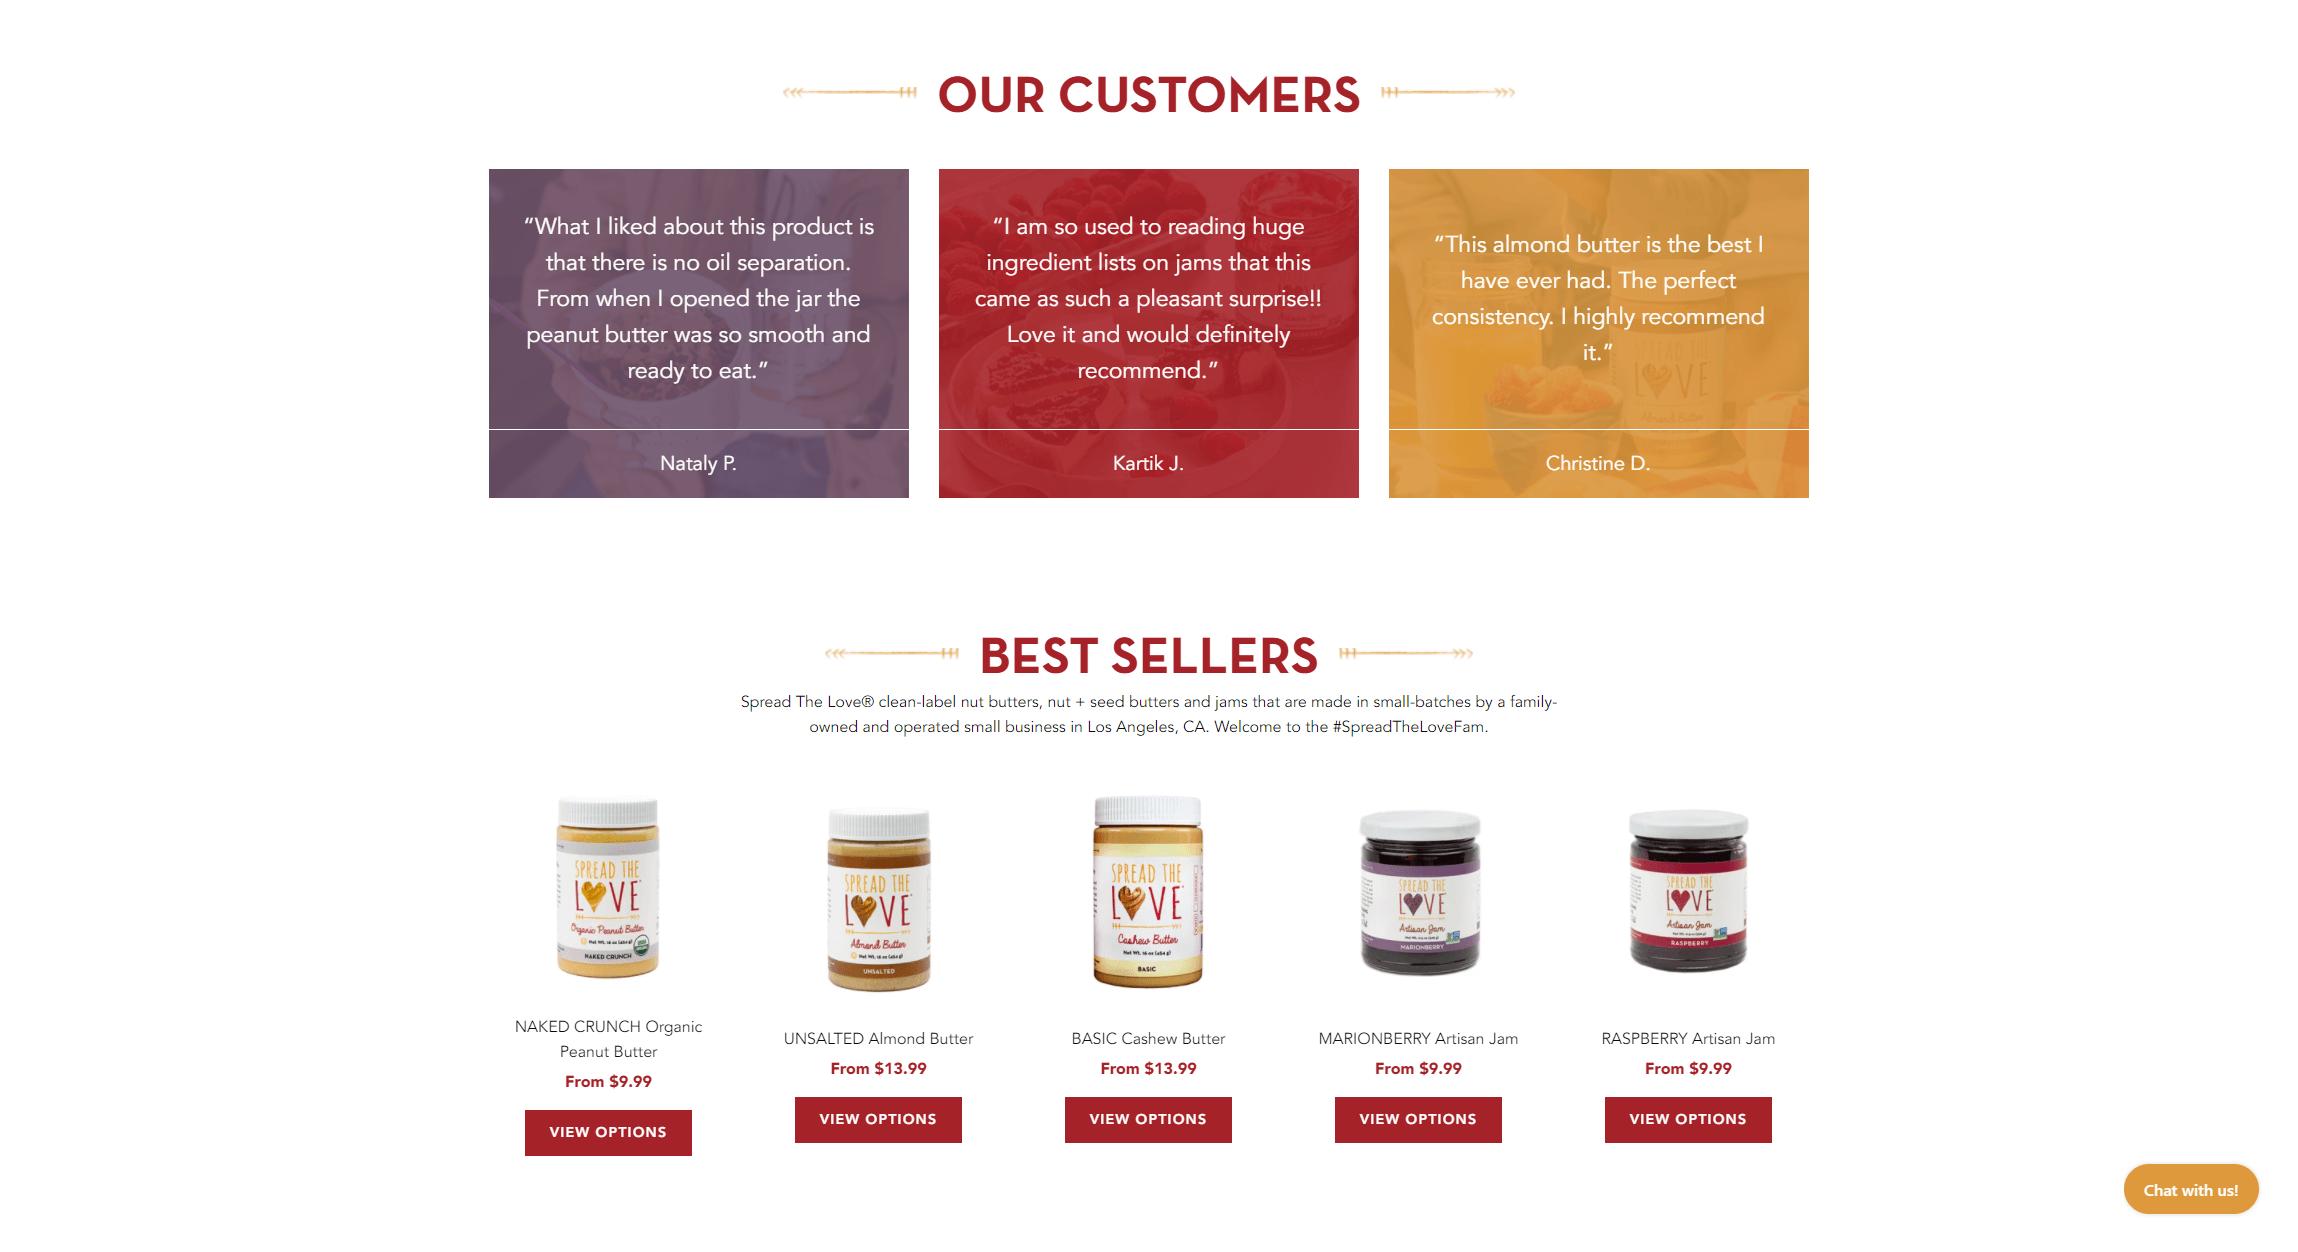 spreadthelovefoods.com-4